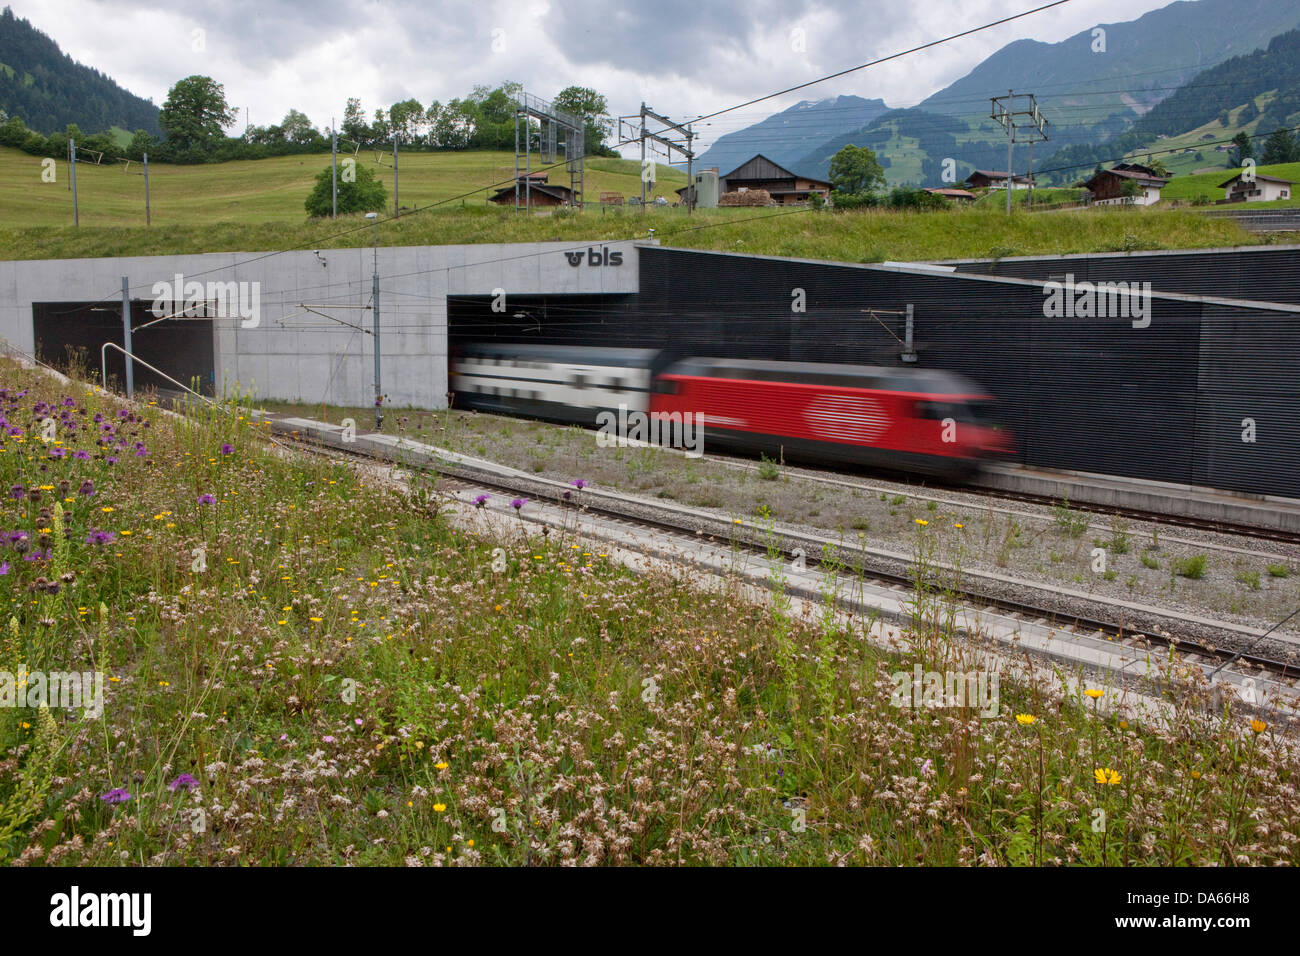 Tunnel, tunnel de base, l'entrée principale, Frutigen, Oberland Bernois, route, chemin de fer, train, chemin Photo Stock